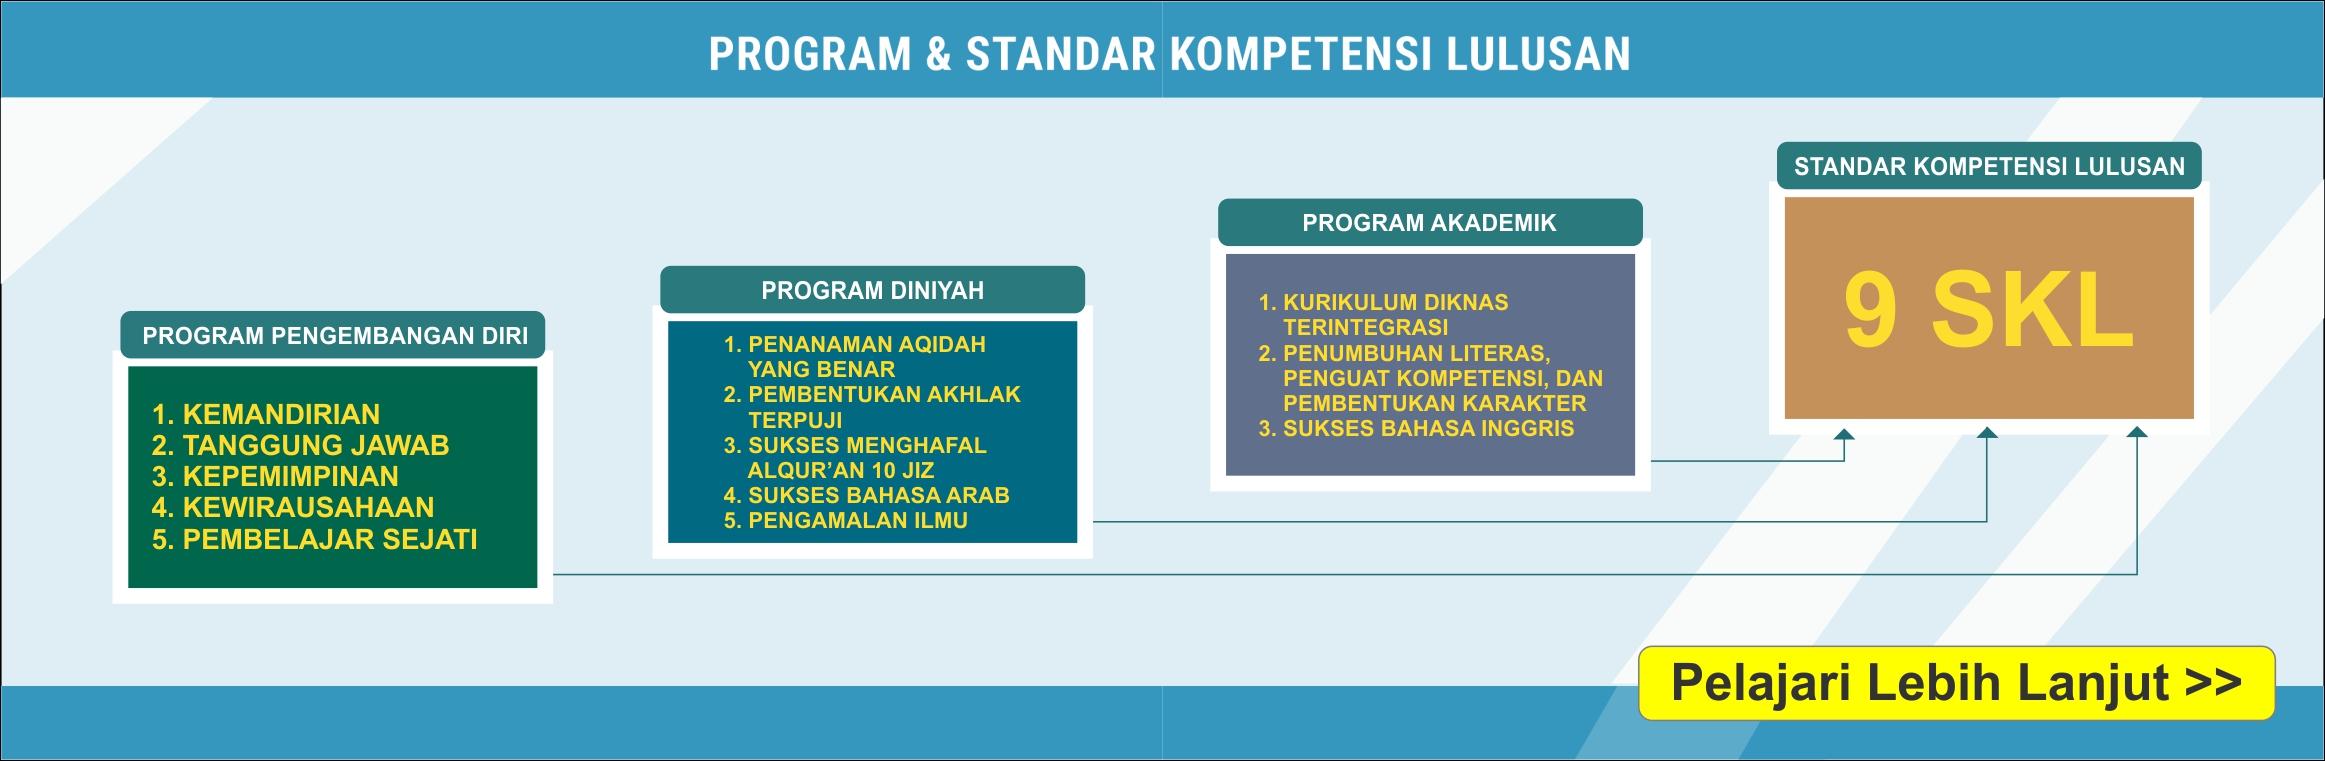 Program SMA BPIBS